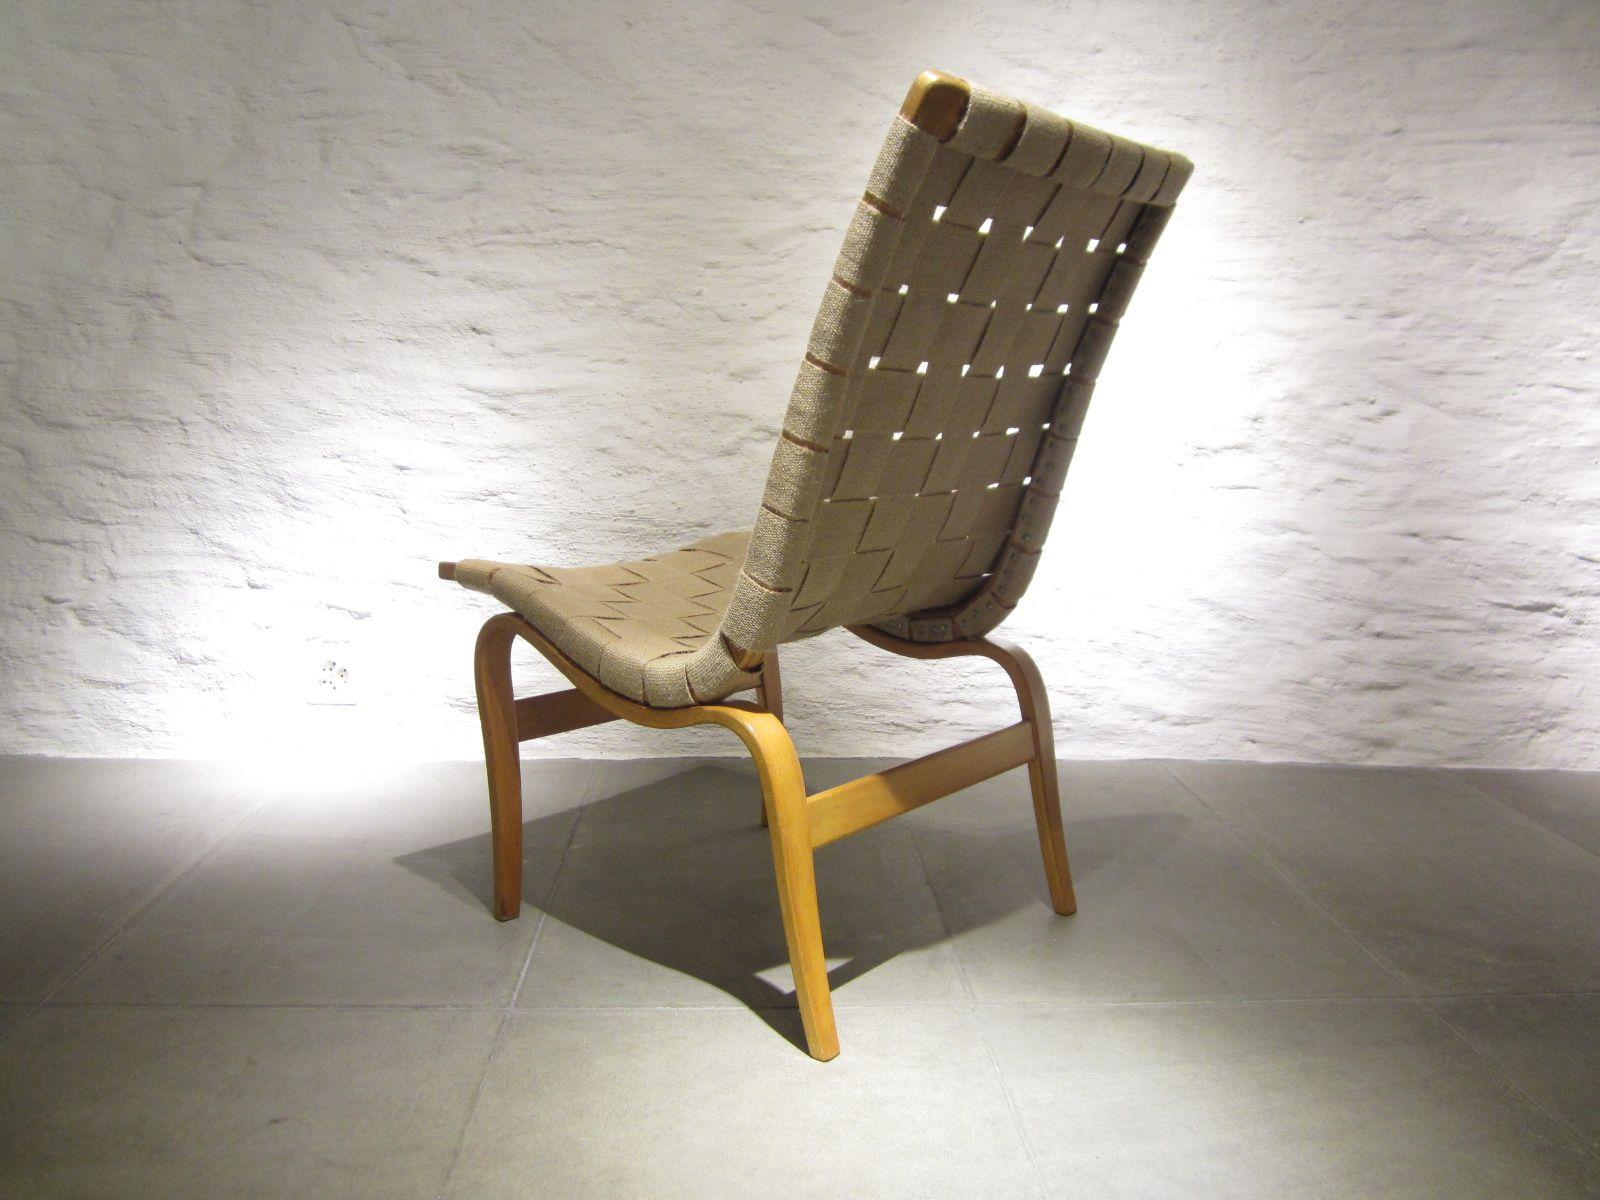 Eva Lounge Chair by Bruno Mathsson for Karl Mathsson 1941 for